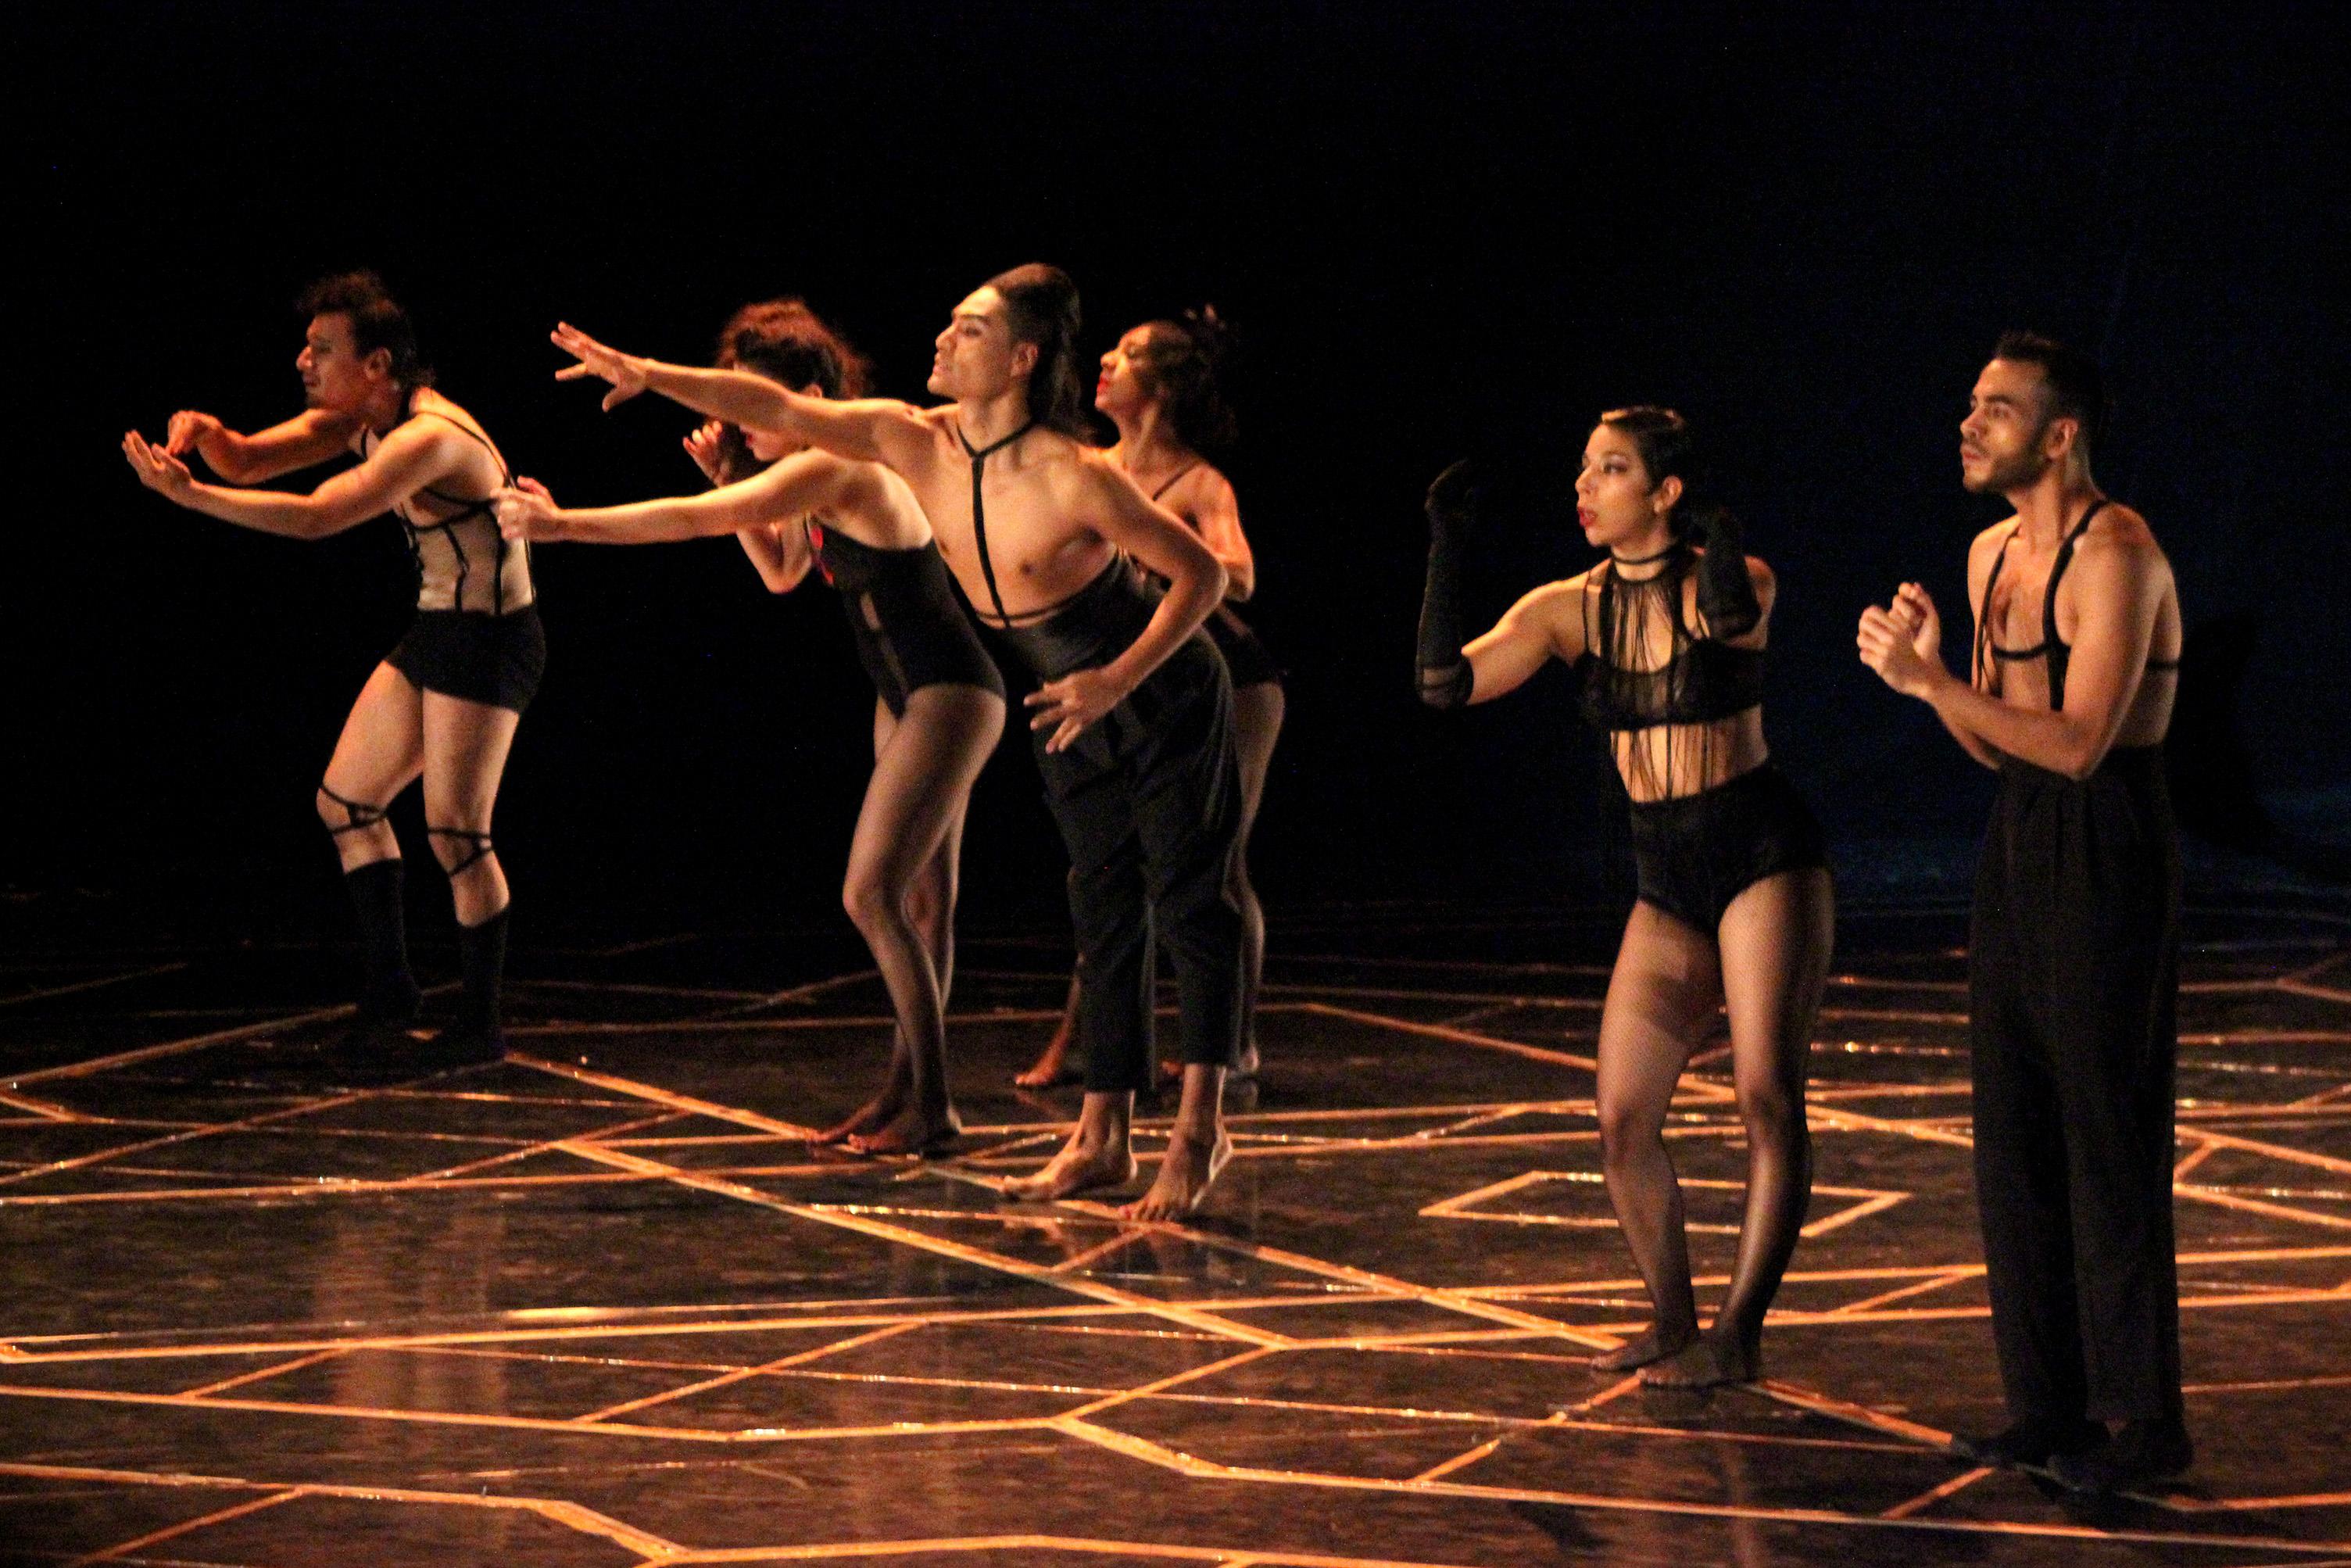 Inició el Festival Internacional de Danza Contemporánea Onésimo González